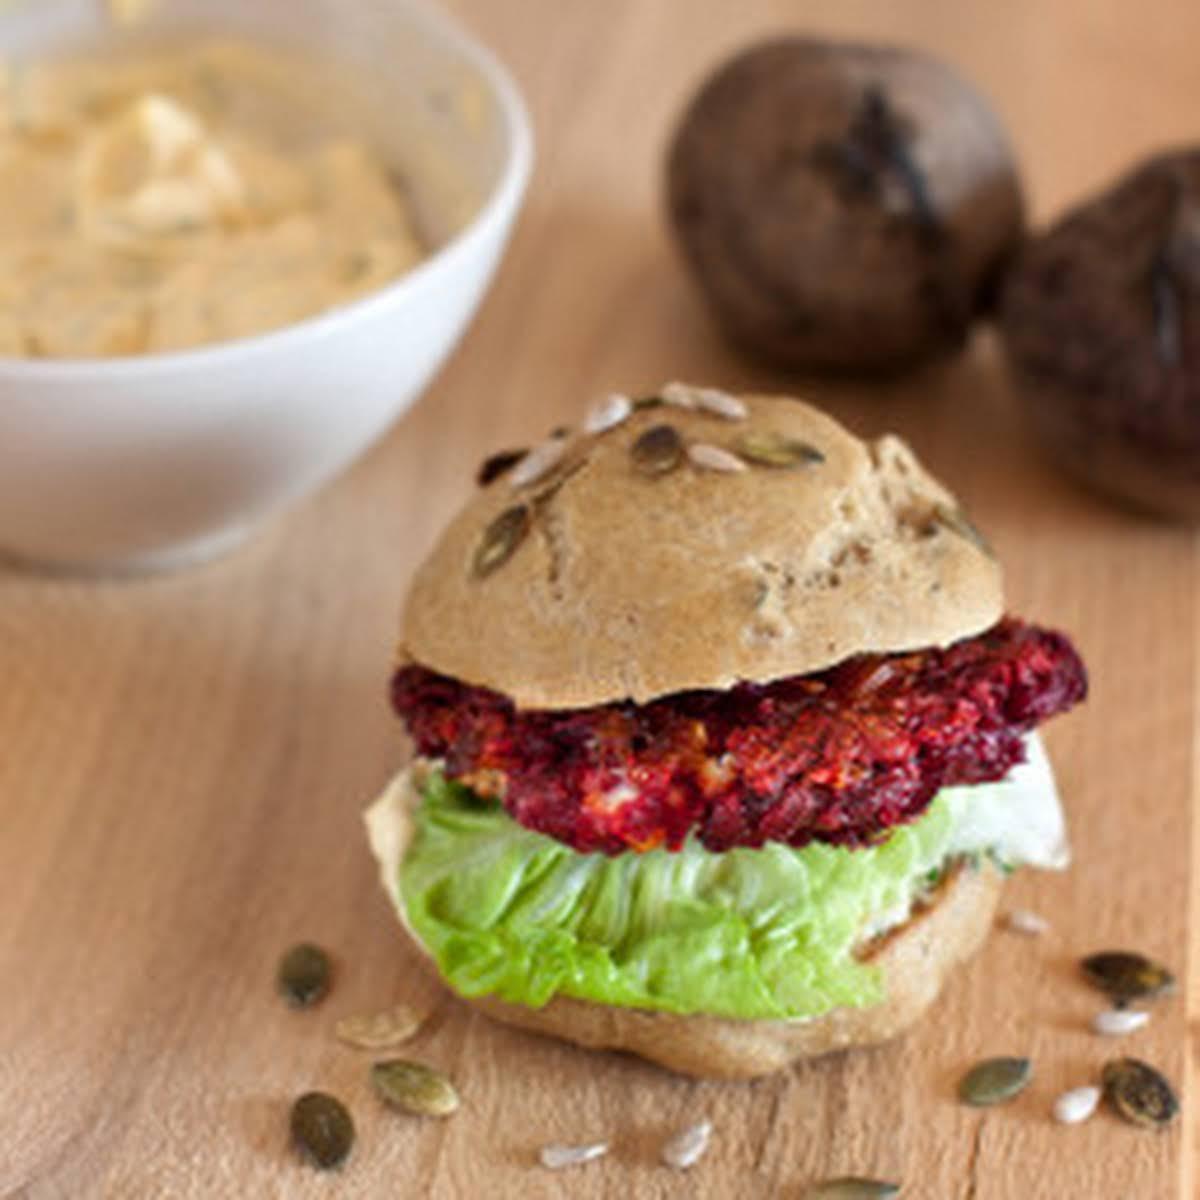 Beet & Bean Burger (Northstar Burger)